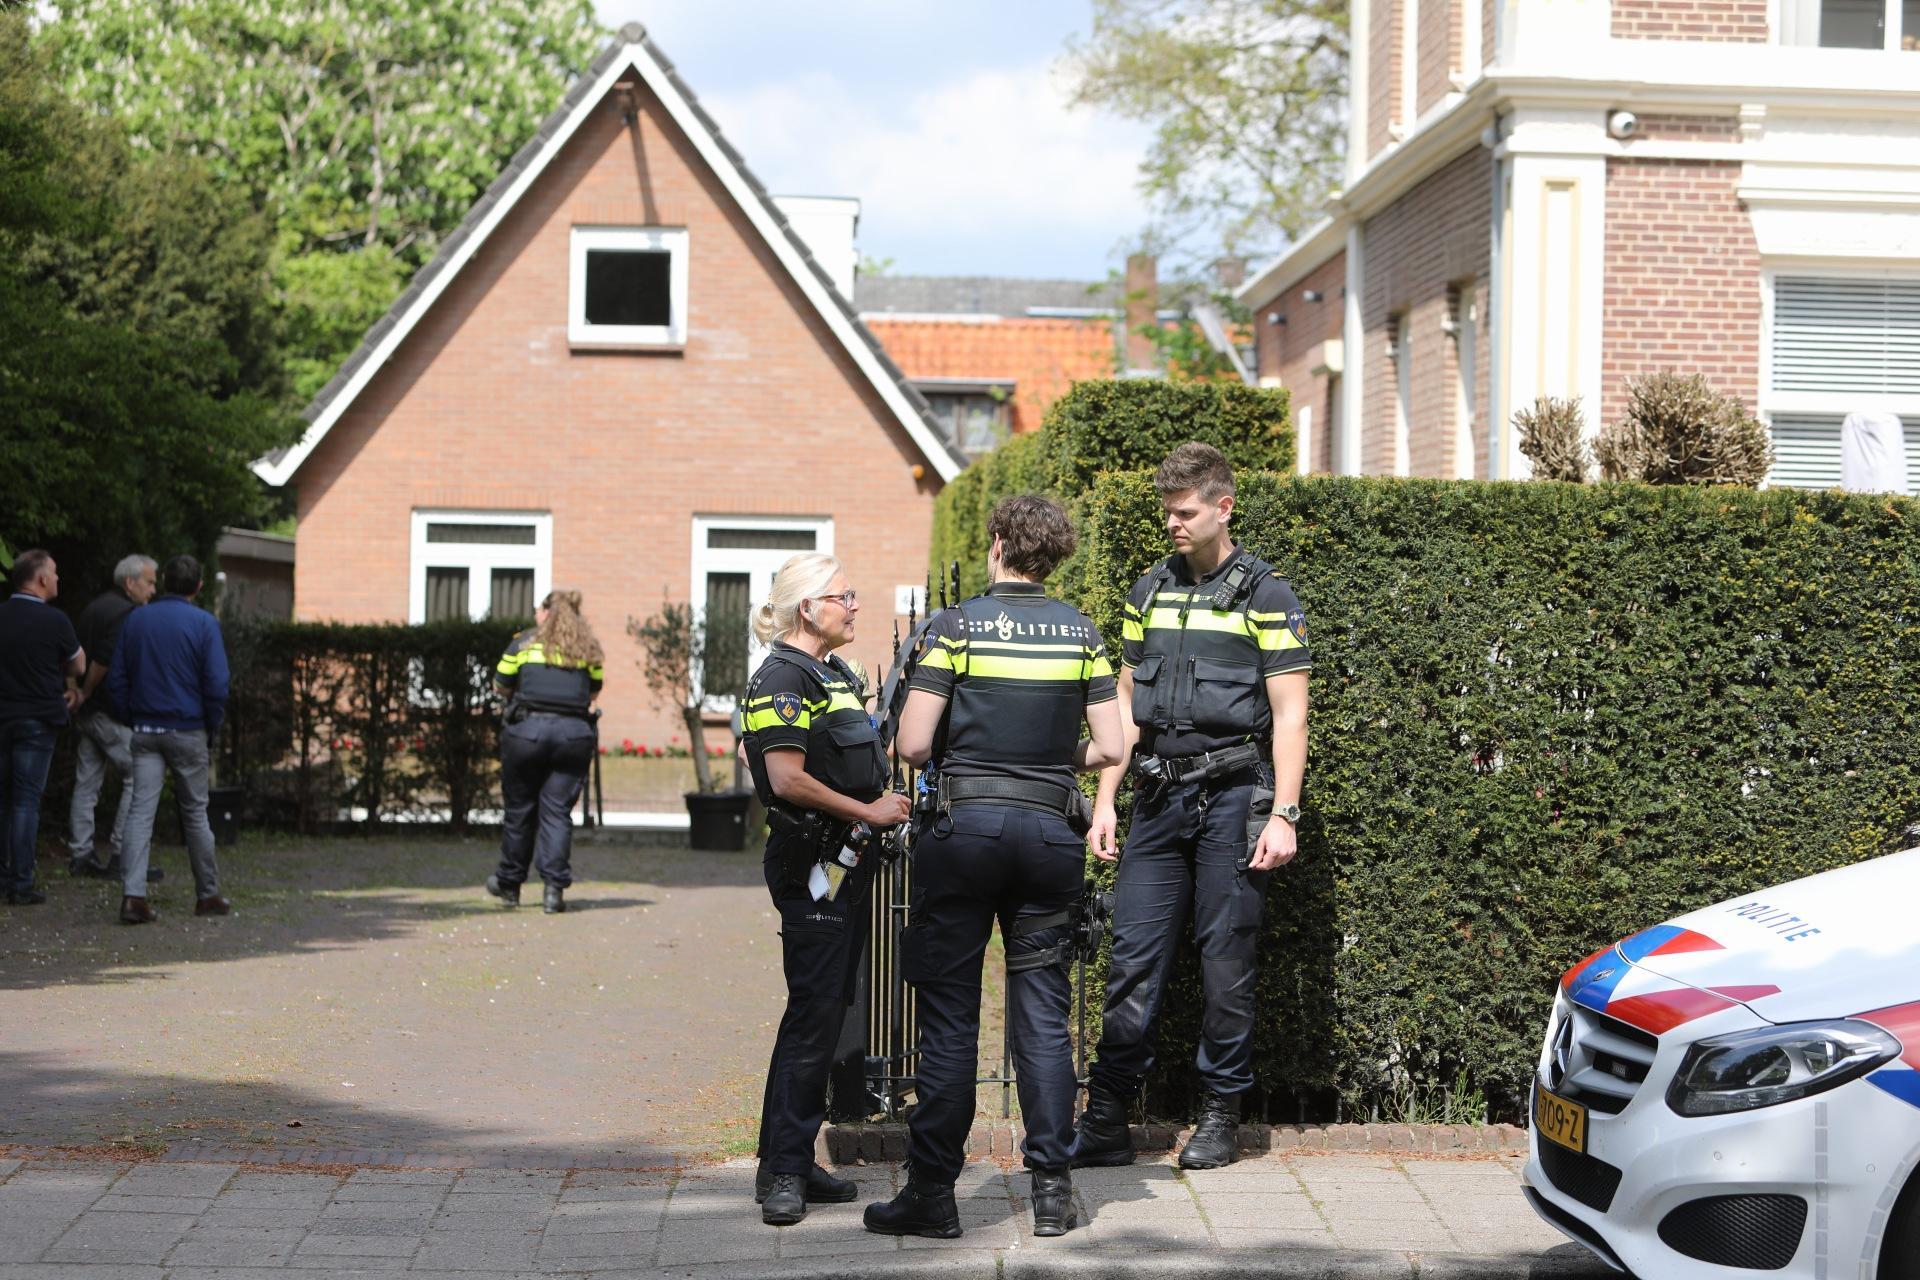 Hennepkwekerij ontdekt in gebouw in Baarn